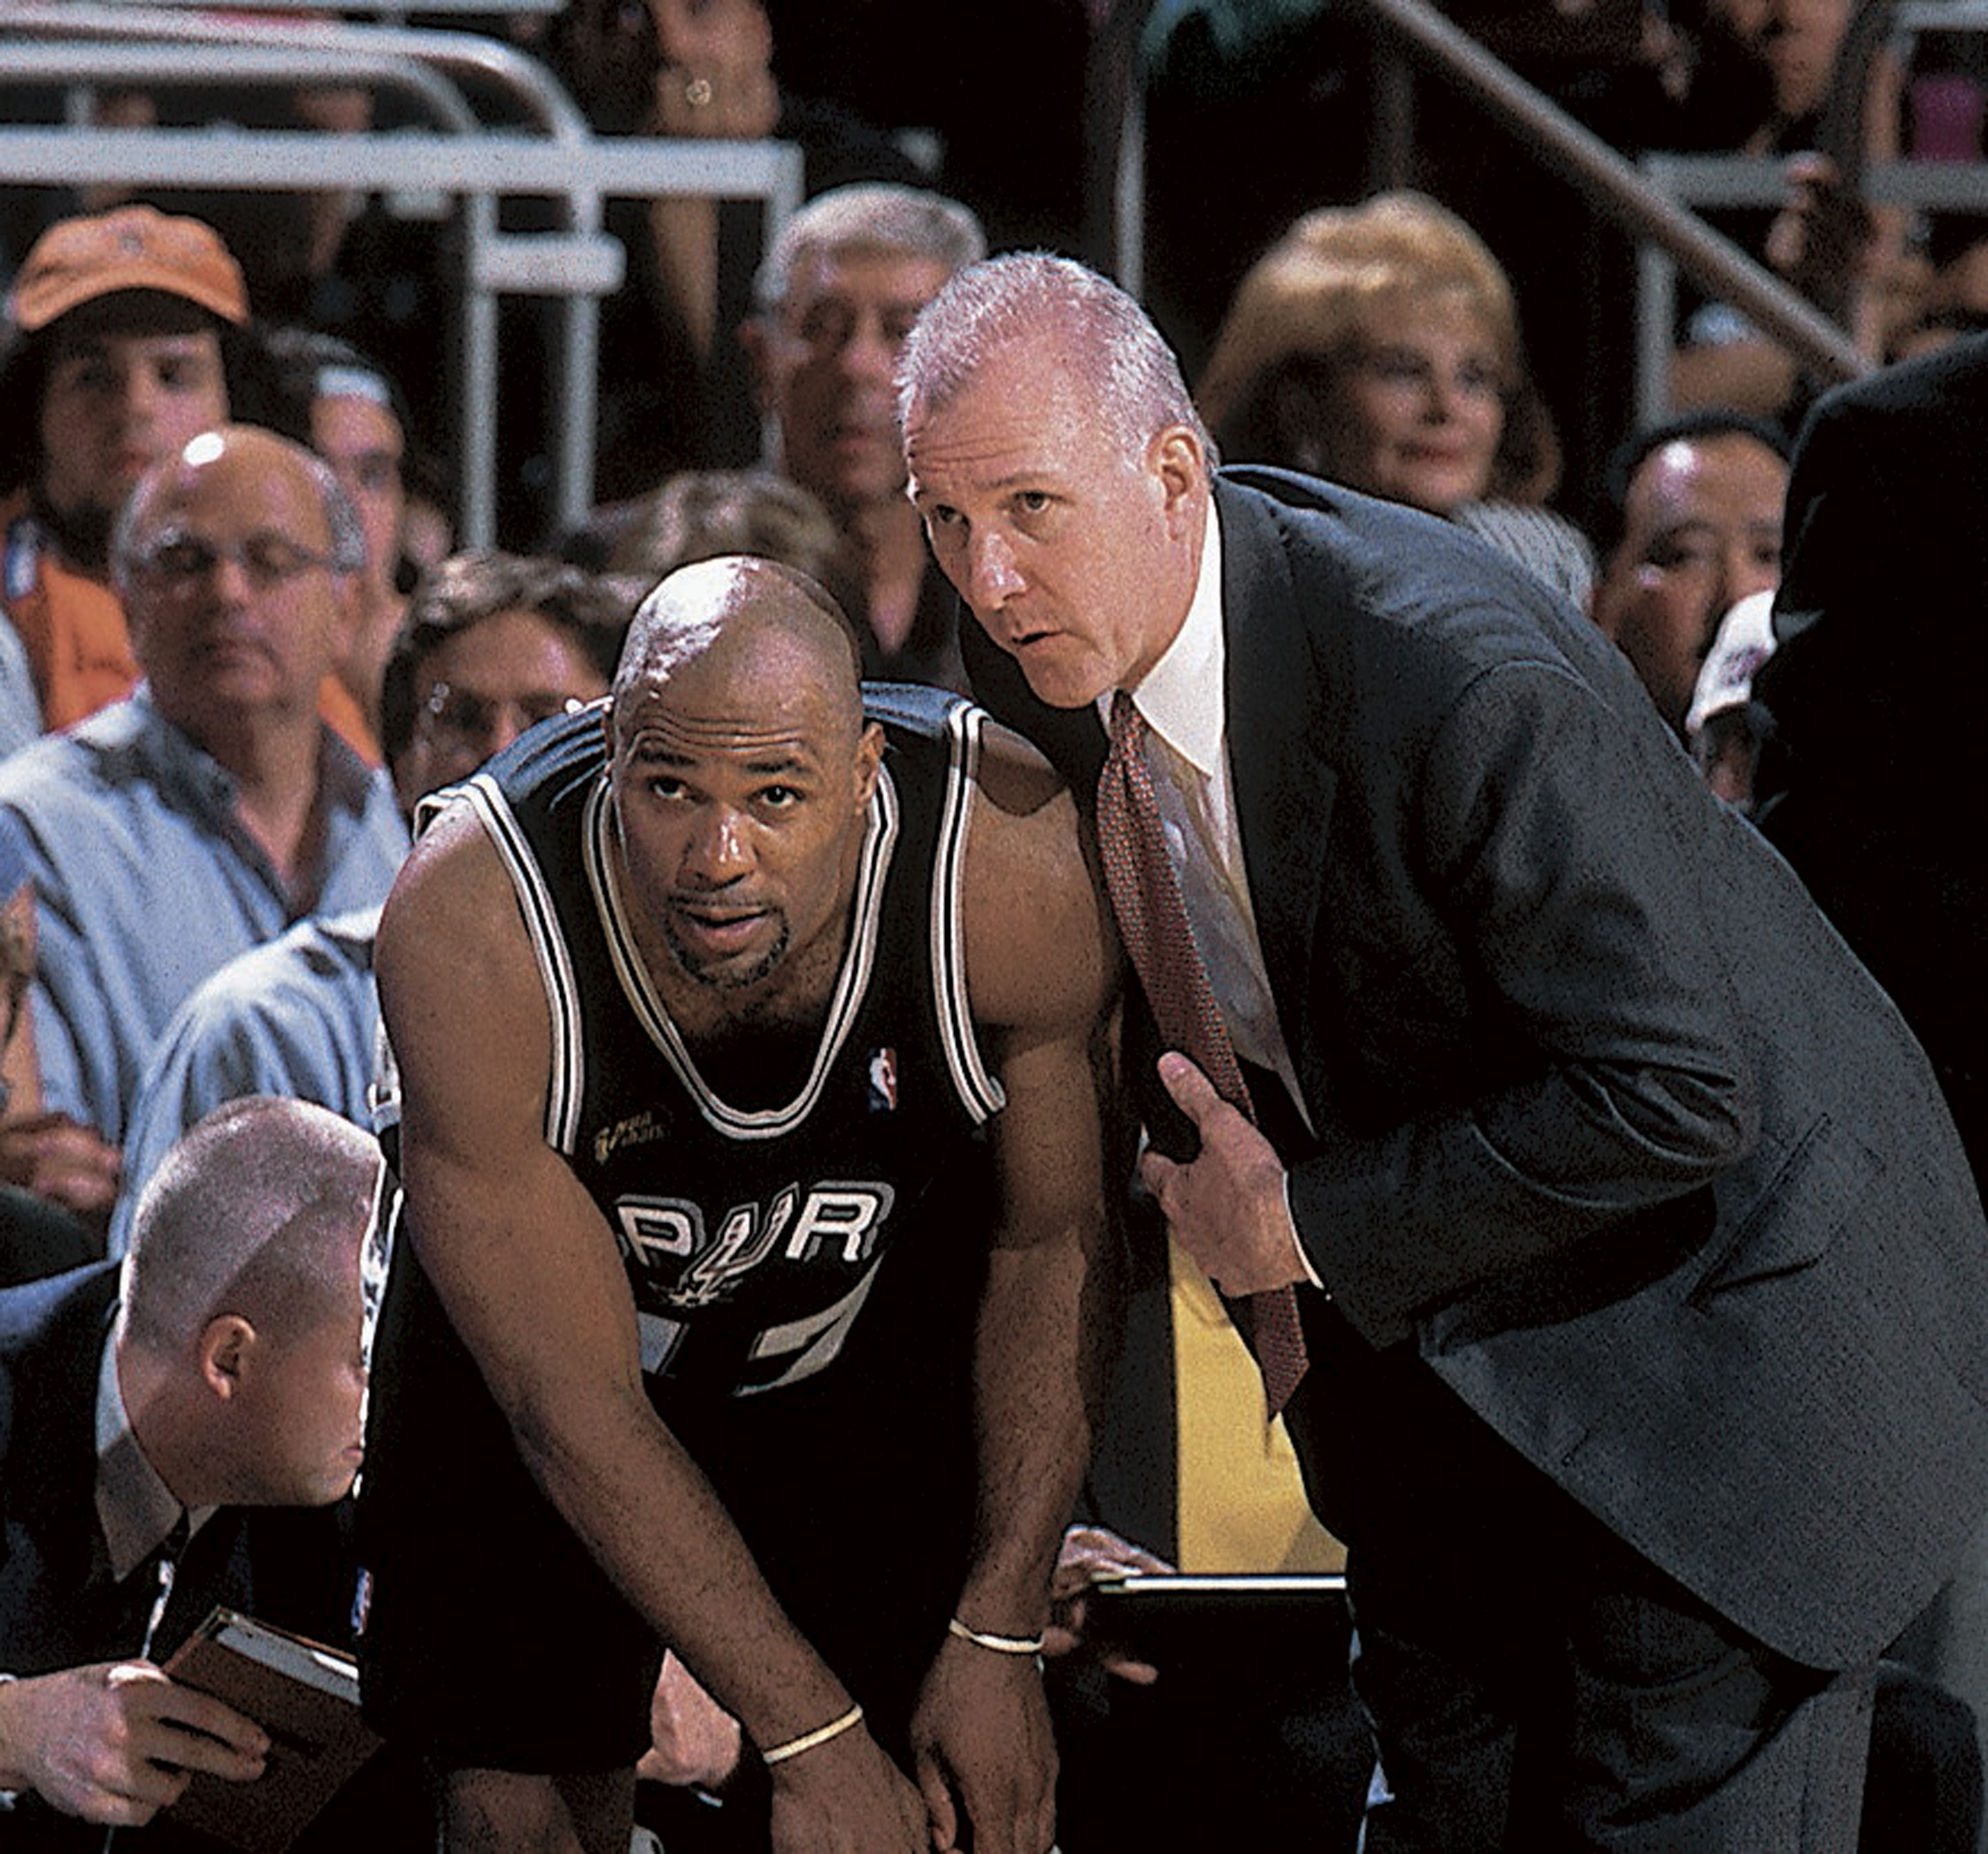 San Antonio Spurs Coach Gregg Popovich, 1999 NBA Finals